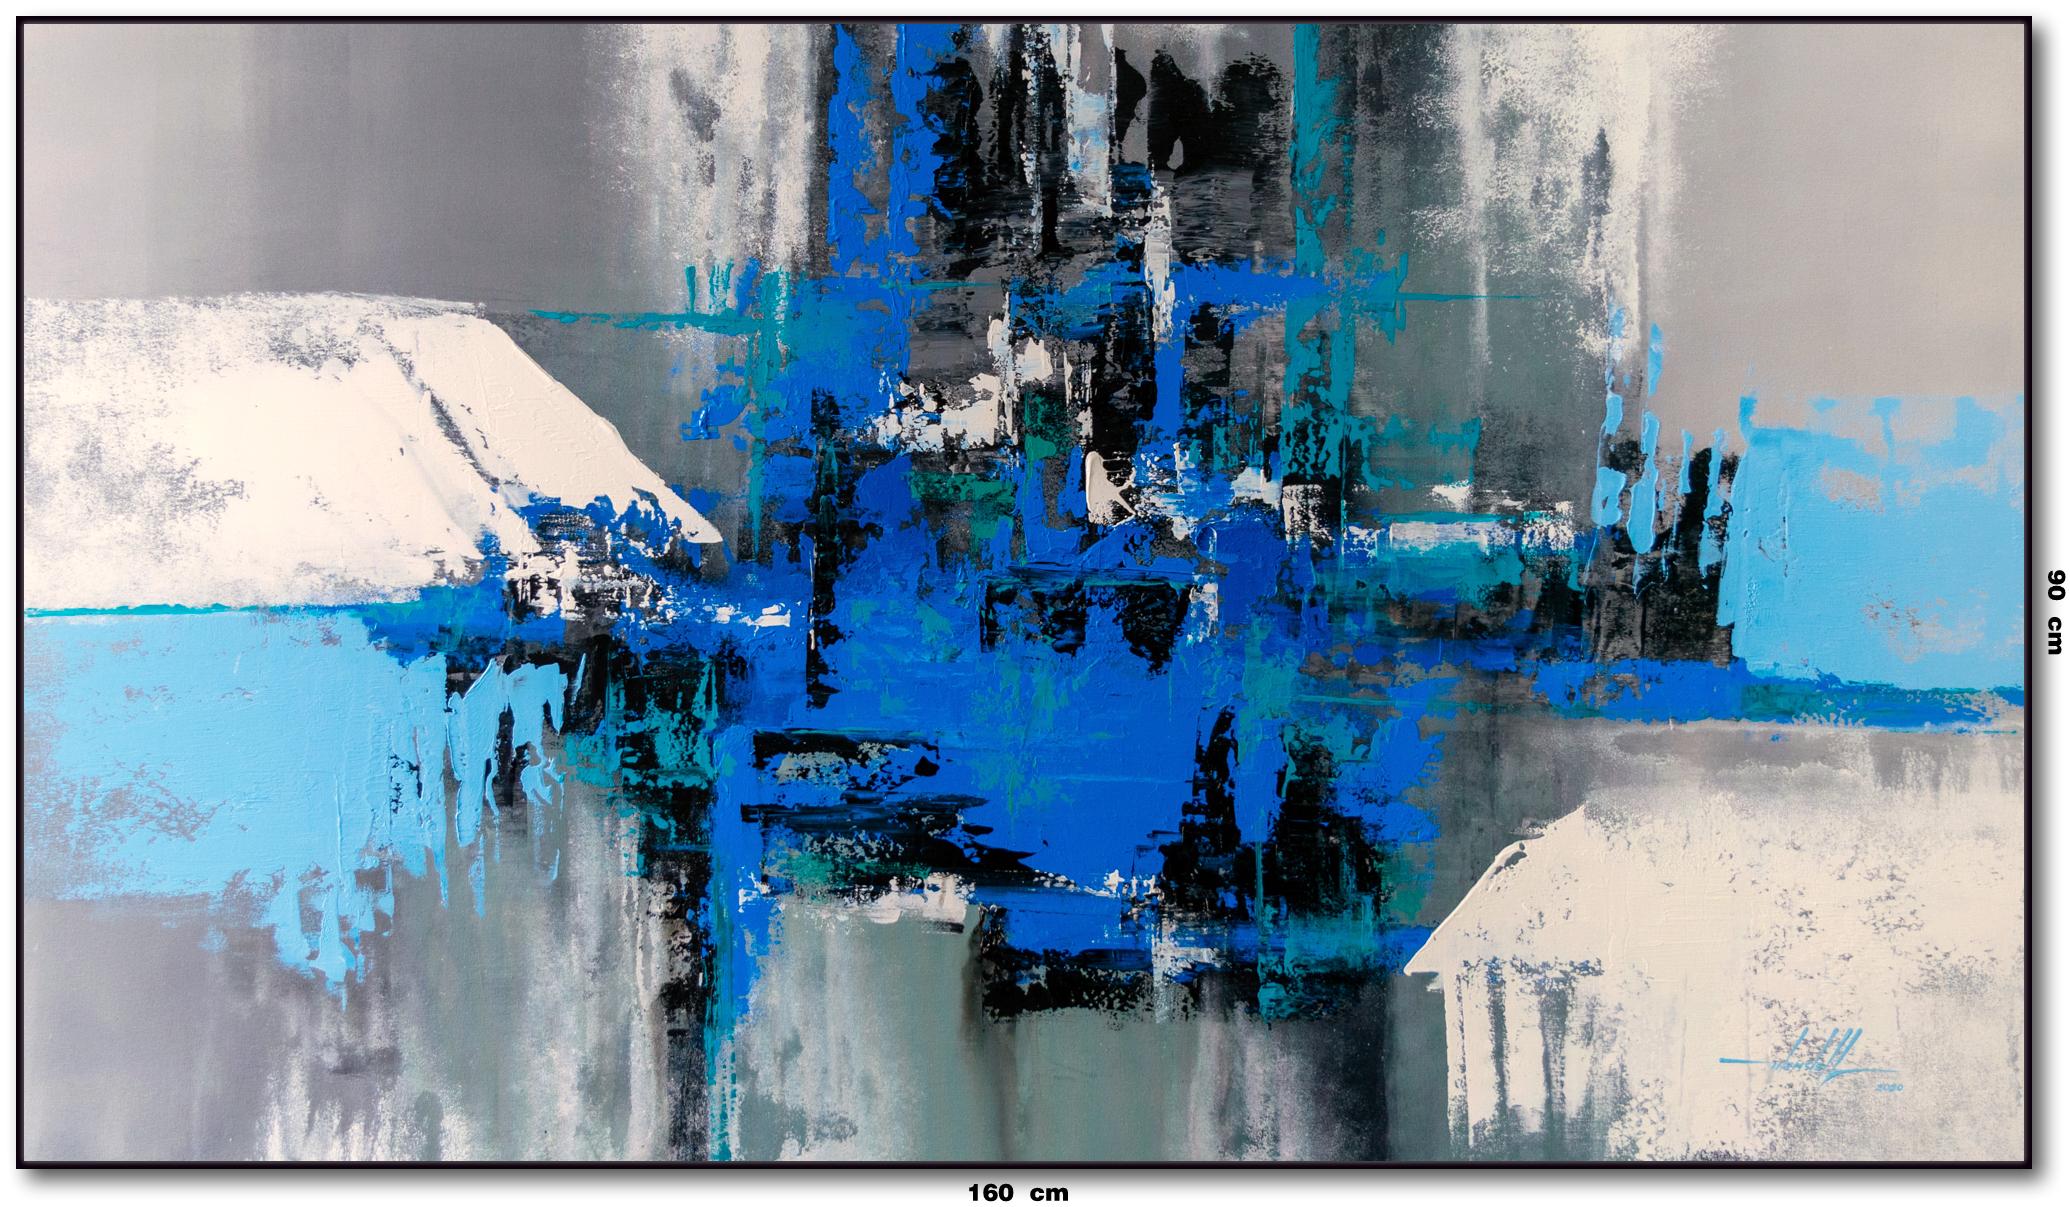 Tela Abstrata Azul Cinza Branco Preto 16